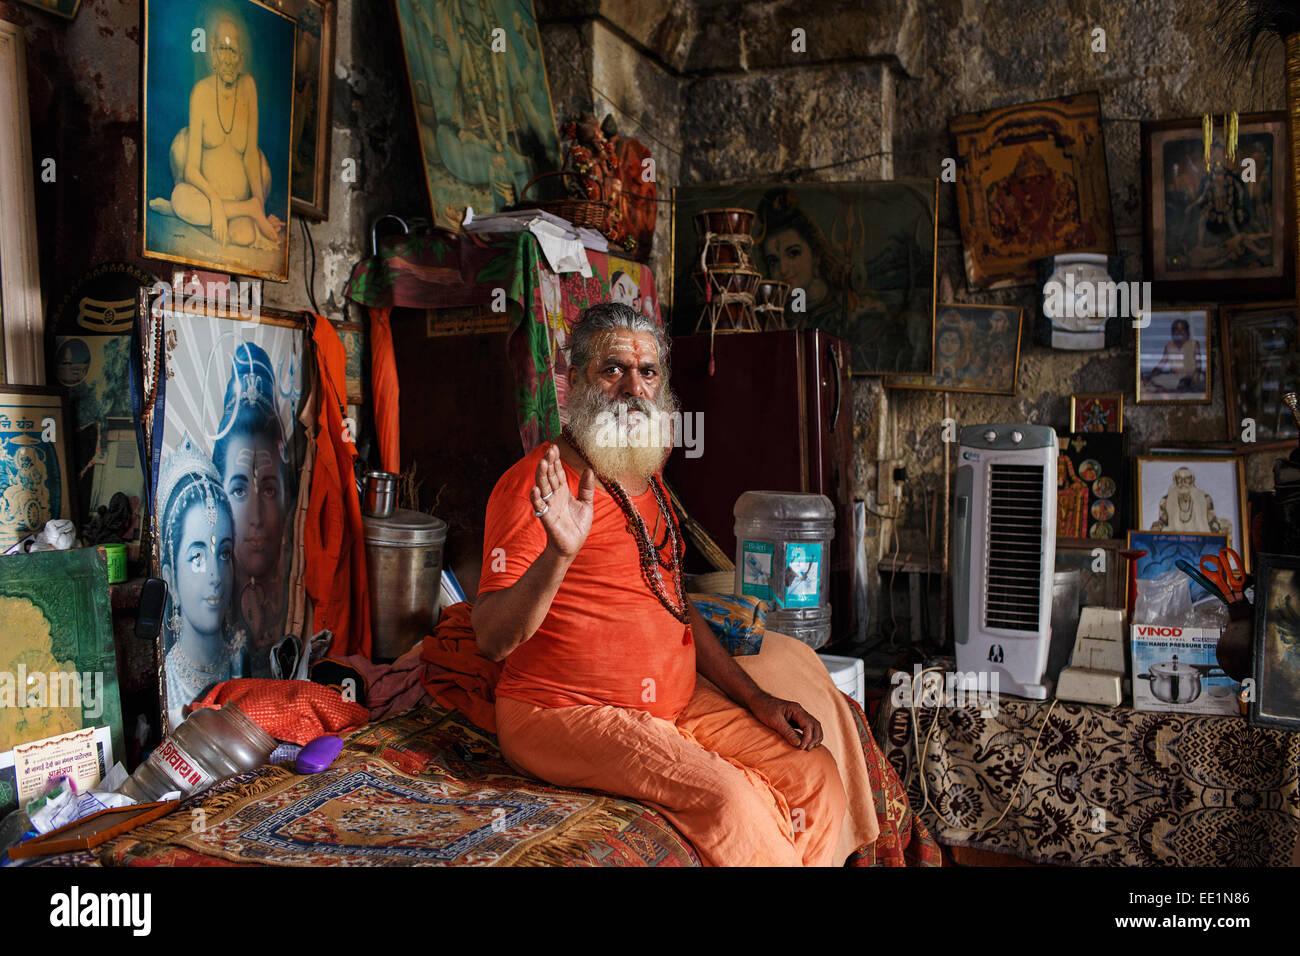 Un Temple Hindou Baba à Babulnath à Mumbai, Inde. Photo Stock